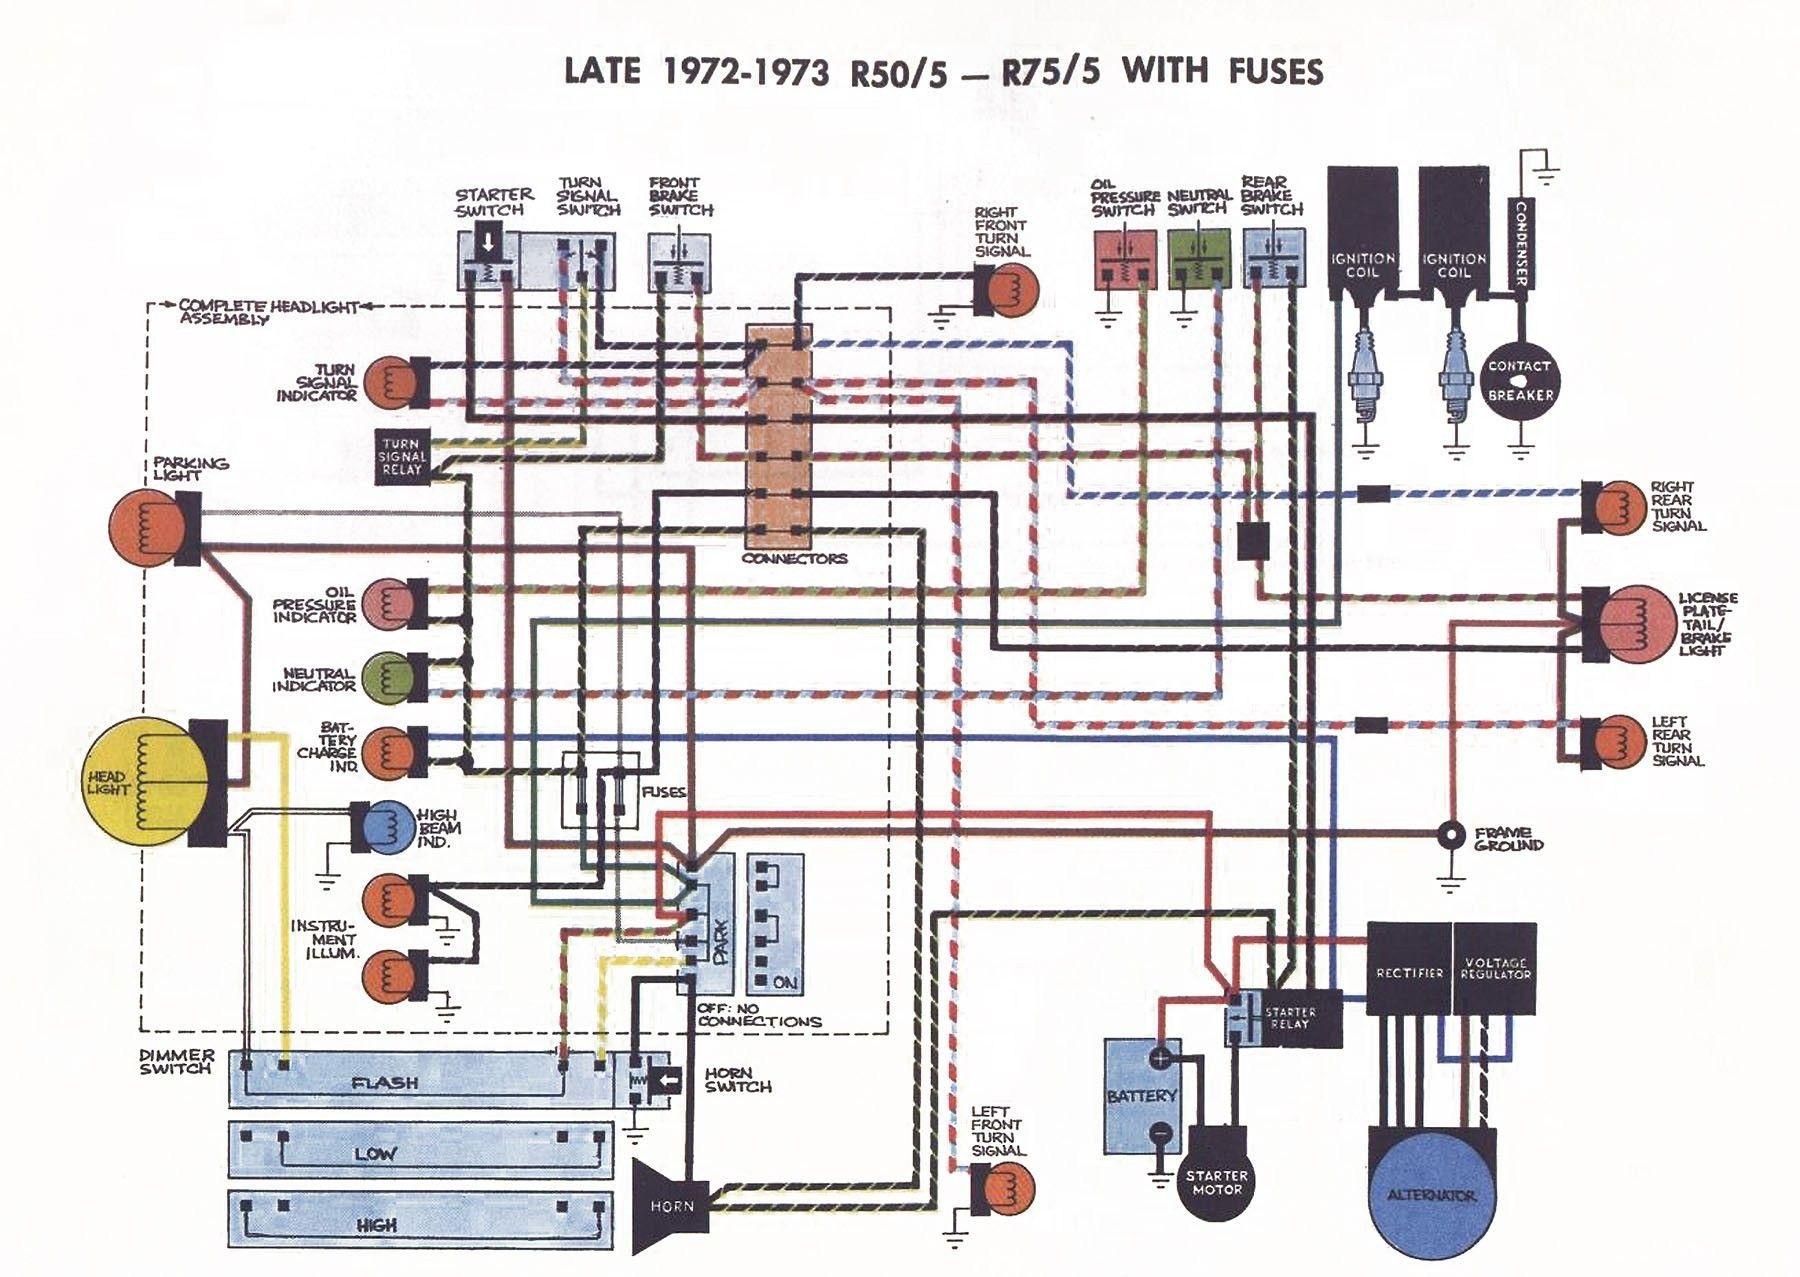 Unique Bmw E46 Pdc Wiring Diagram (With images) Diagram